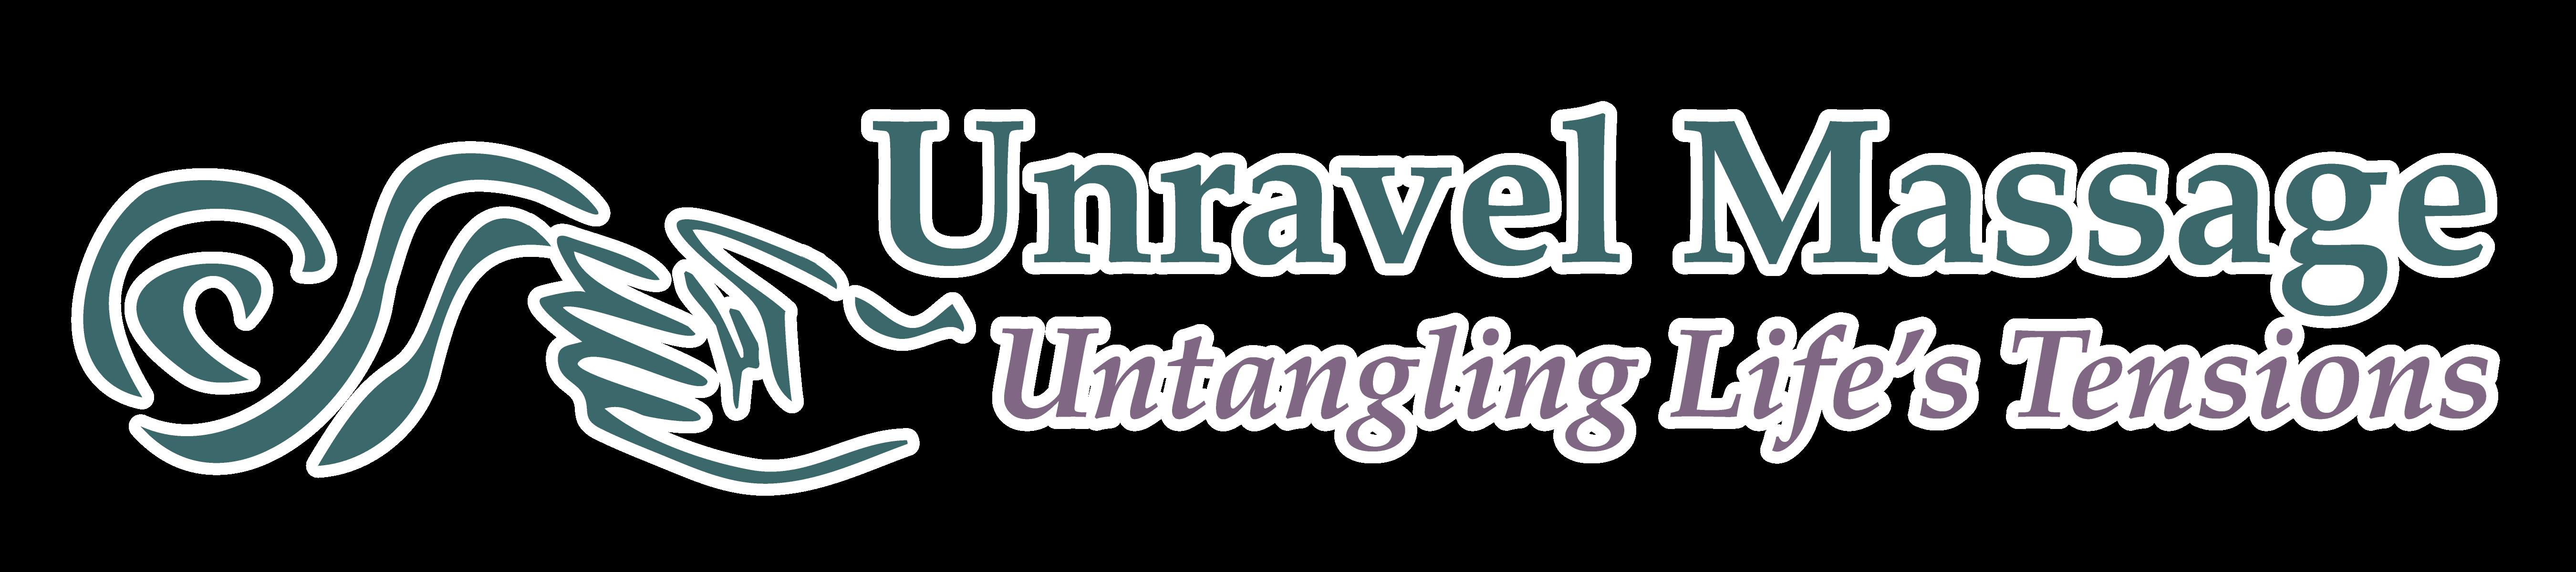 Unravel Massage Logo